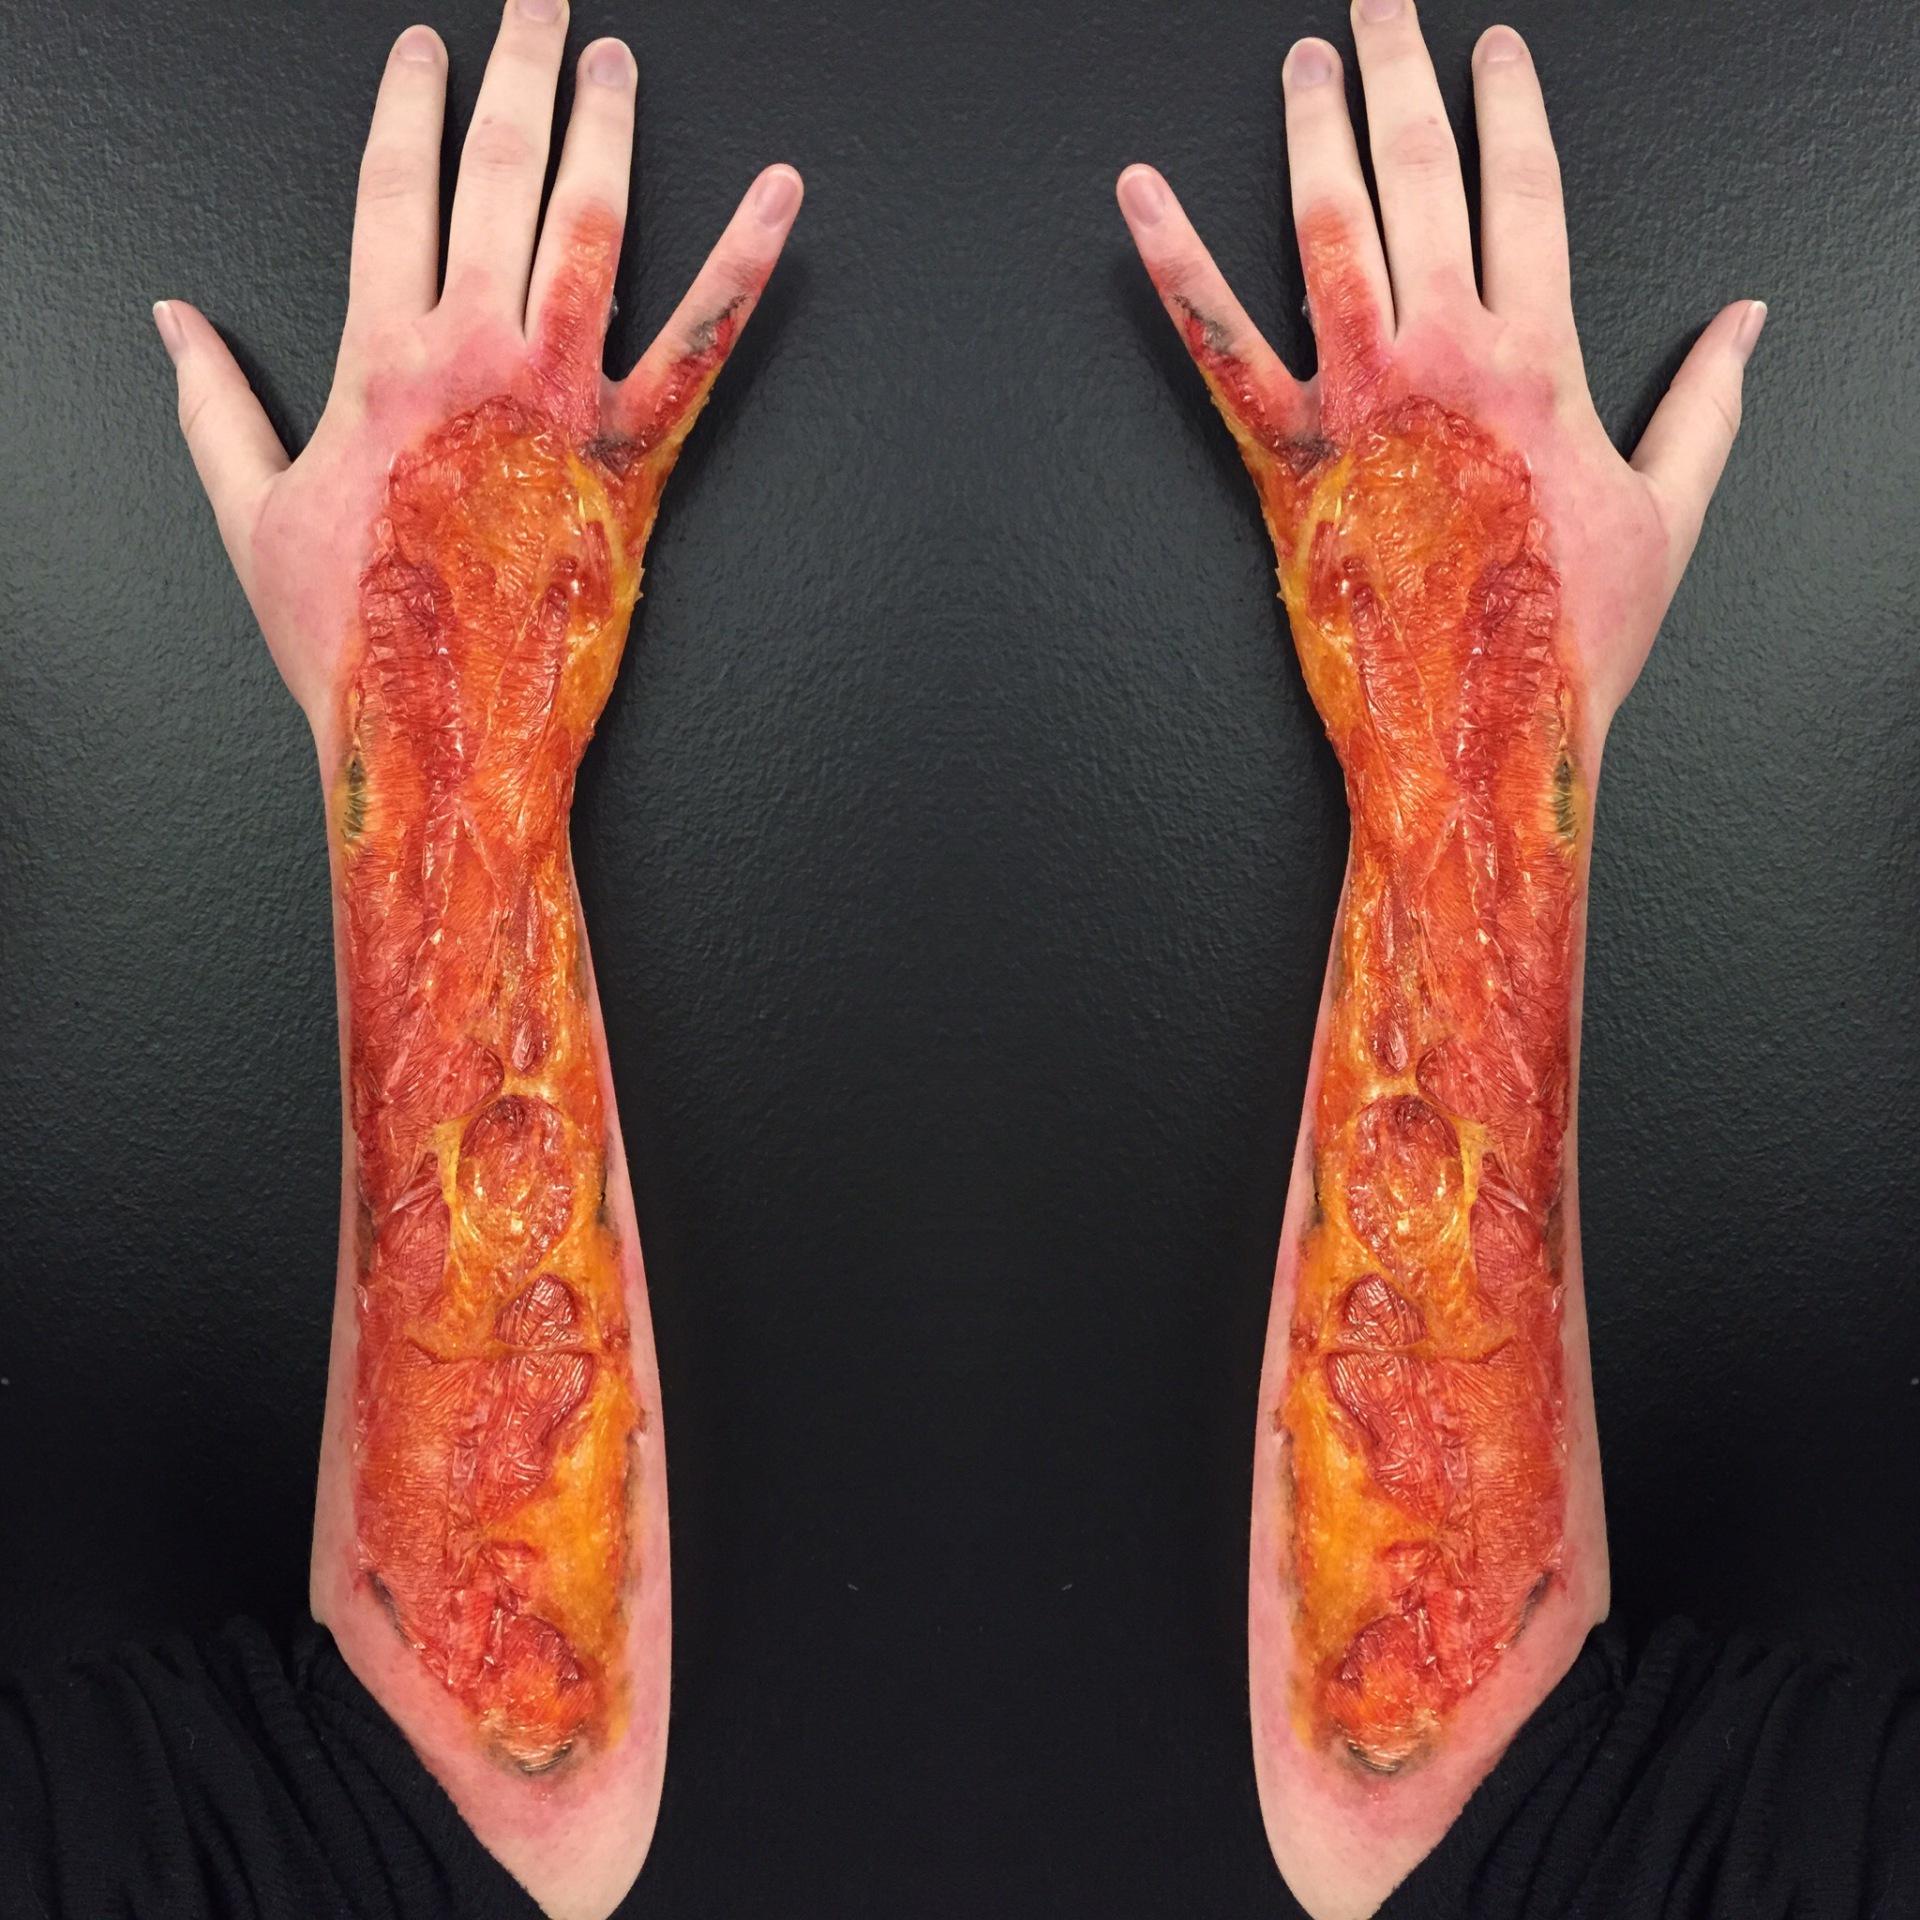 3rd Degree Gelatin Burn